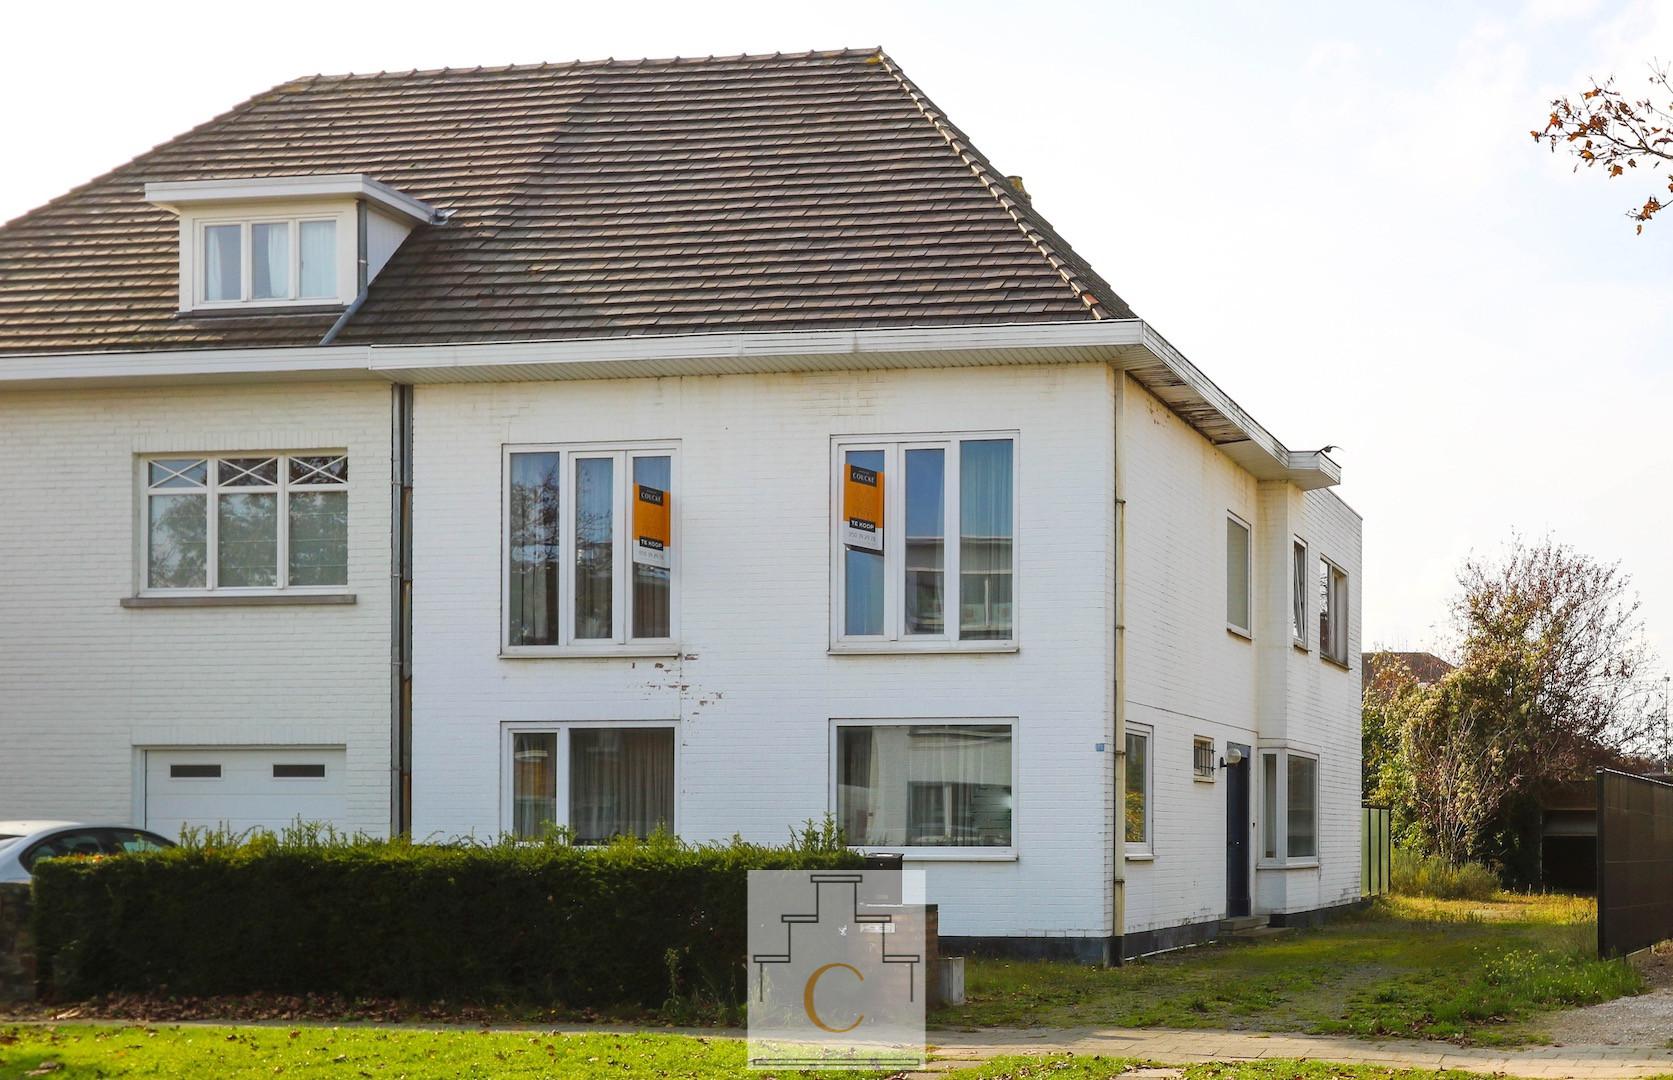 Ruime halfopen gezinswoning met dubbele garage en flinke tuin, tussen Sint Andries en Kristus Koning